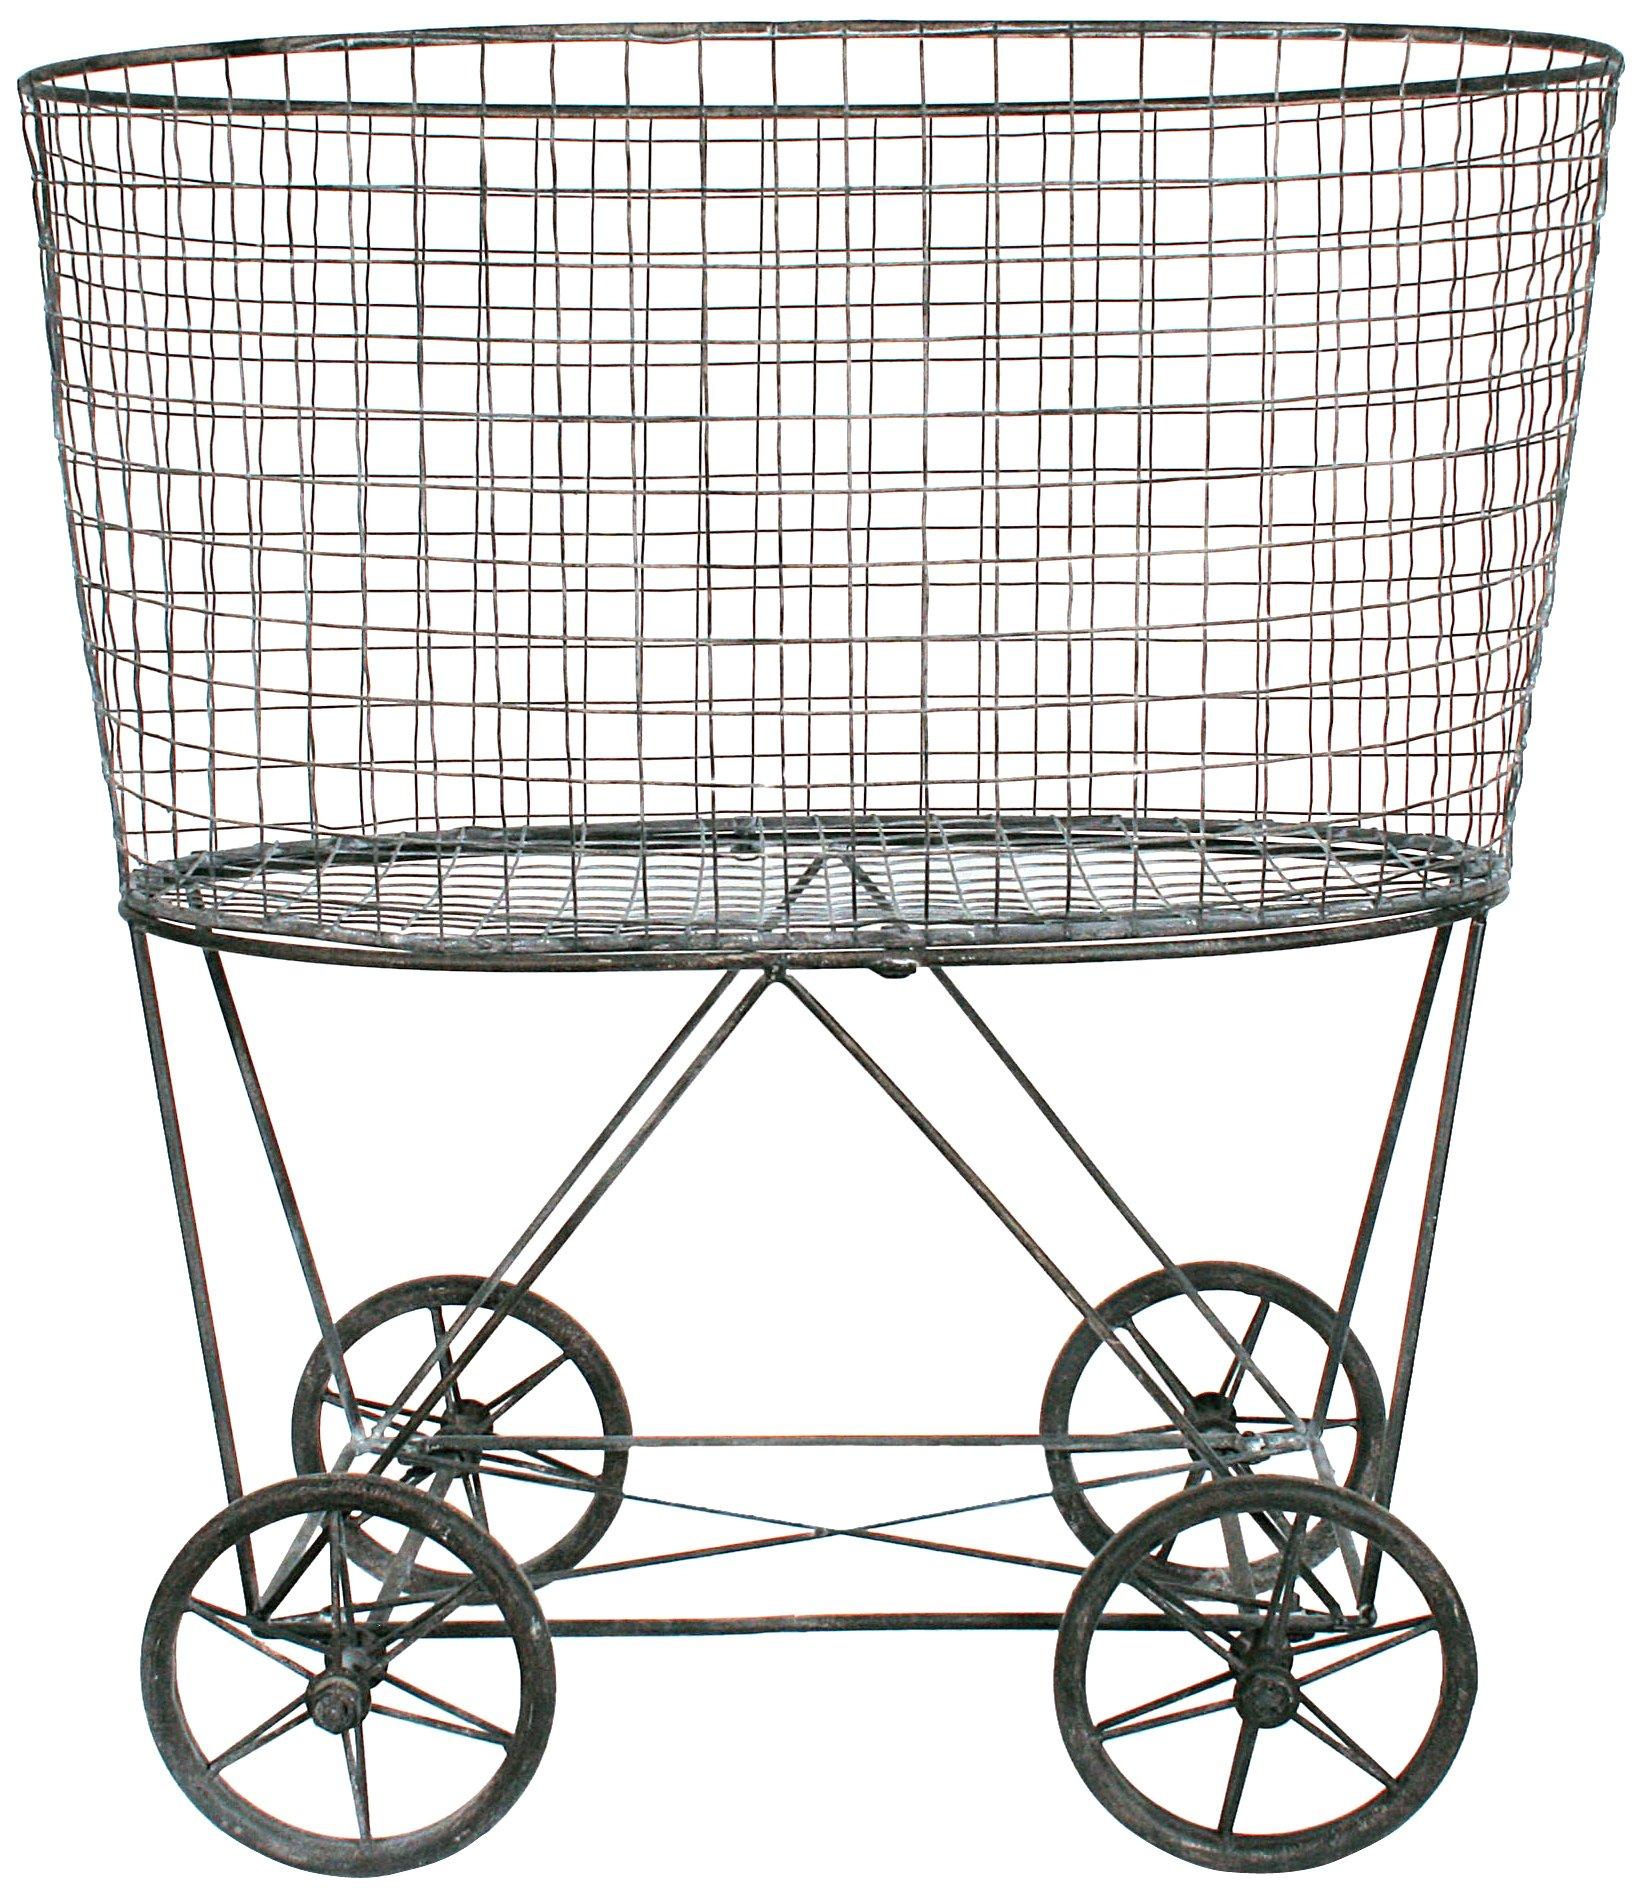 Creative Co-Op DE2757 Metal Vintage Laundry Basket with Wheels